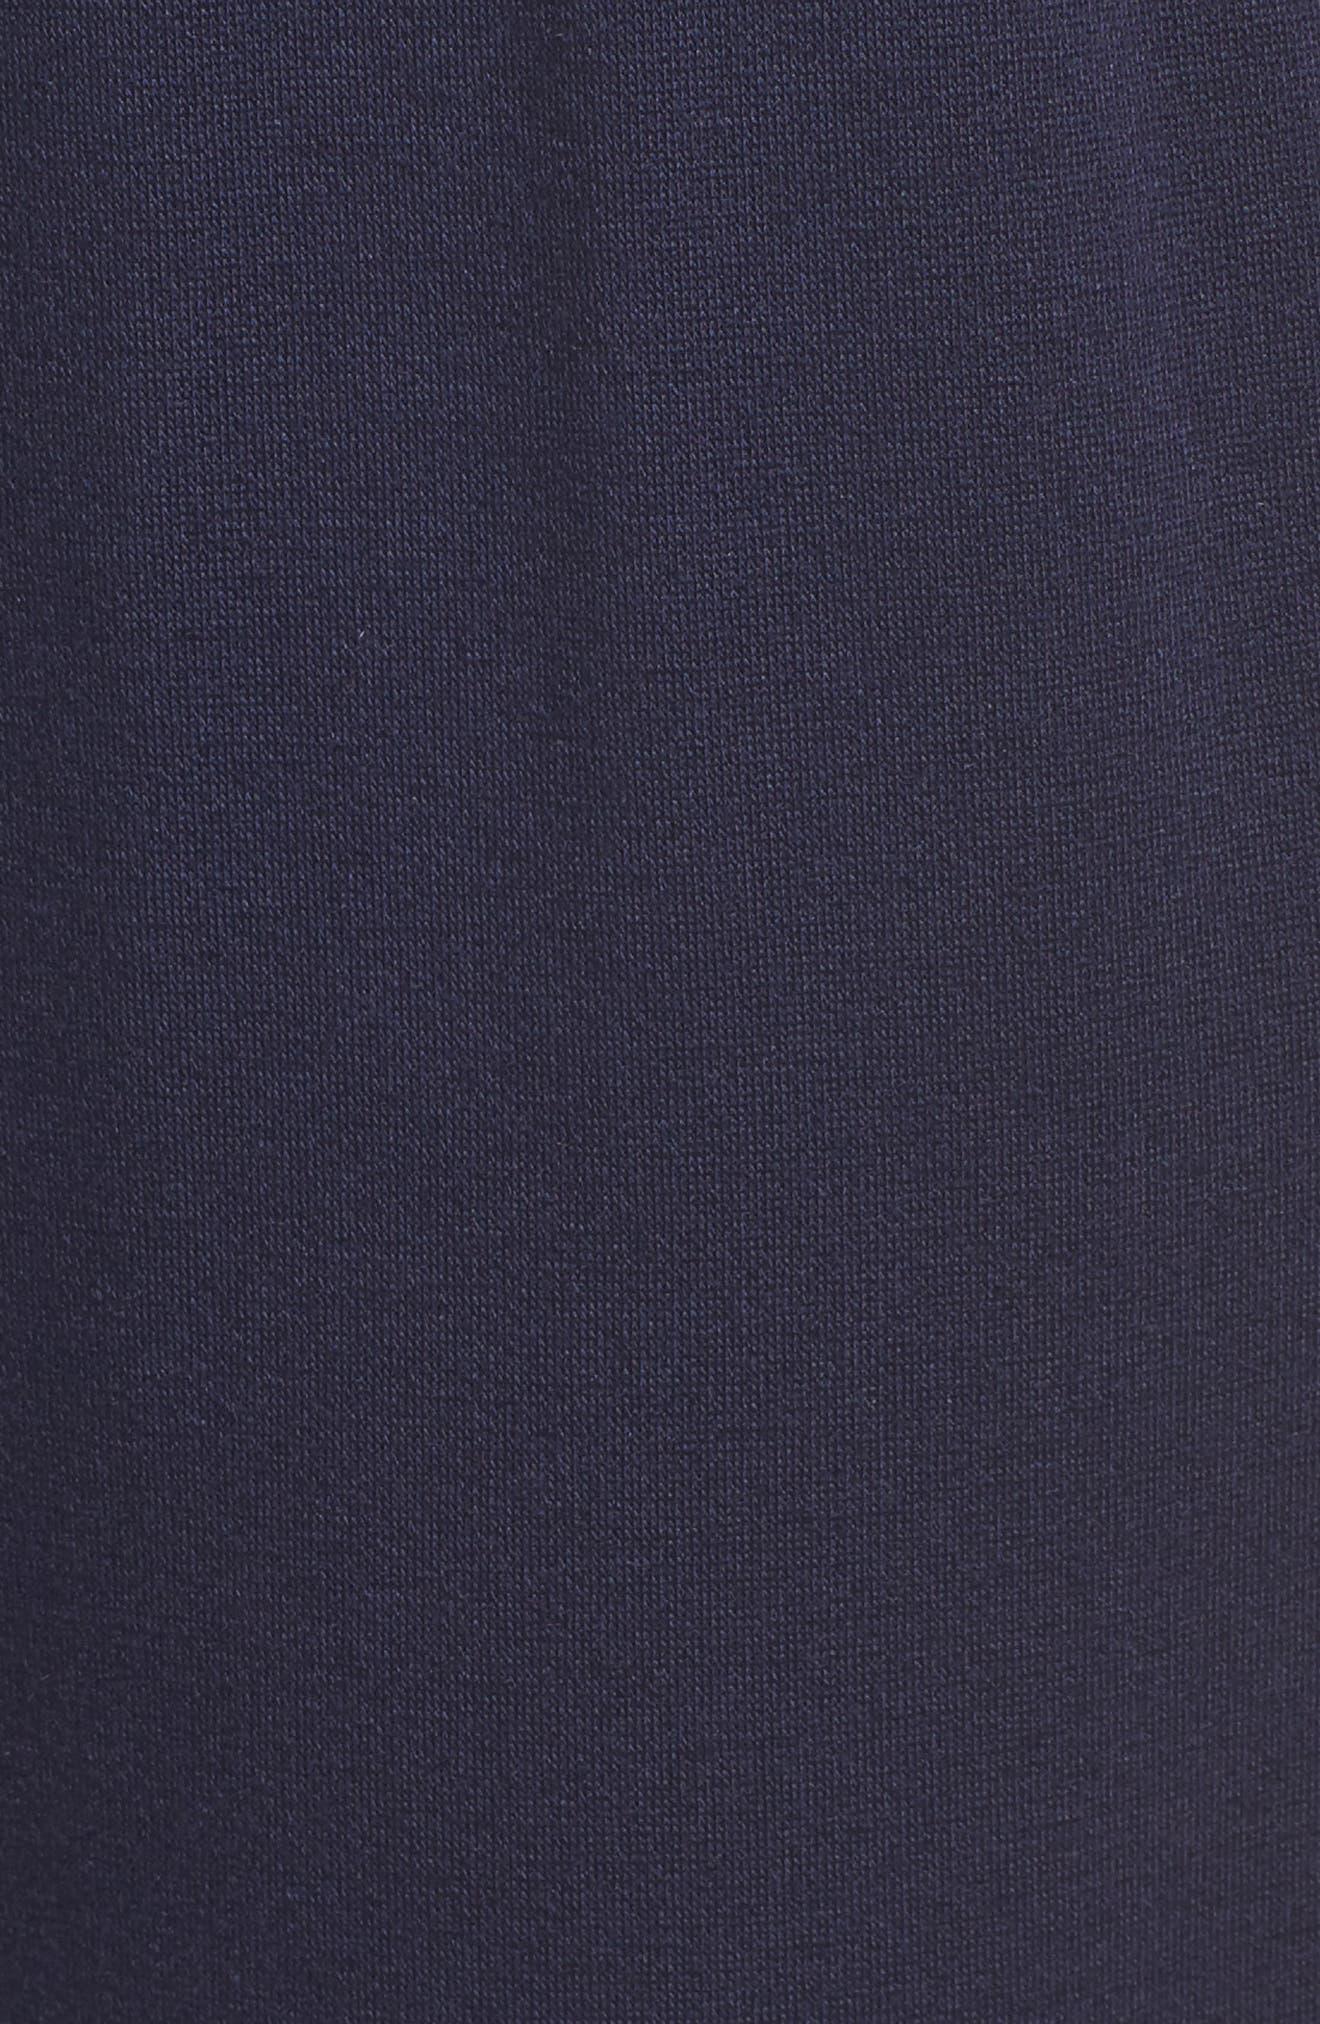 Drawstring Waist Knit Pants,                             Alternate thumbnail 14, color,